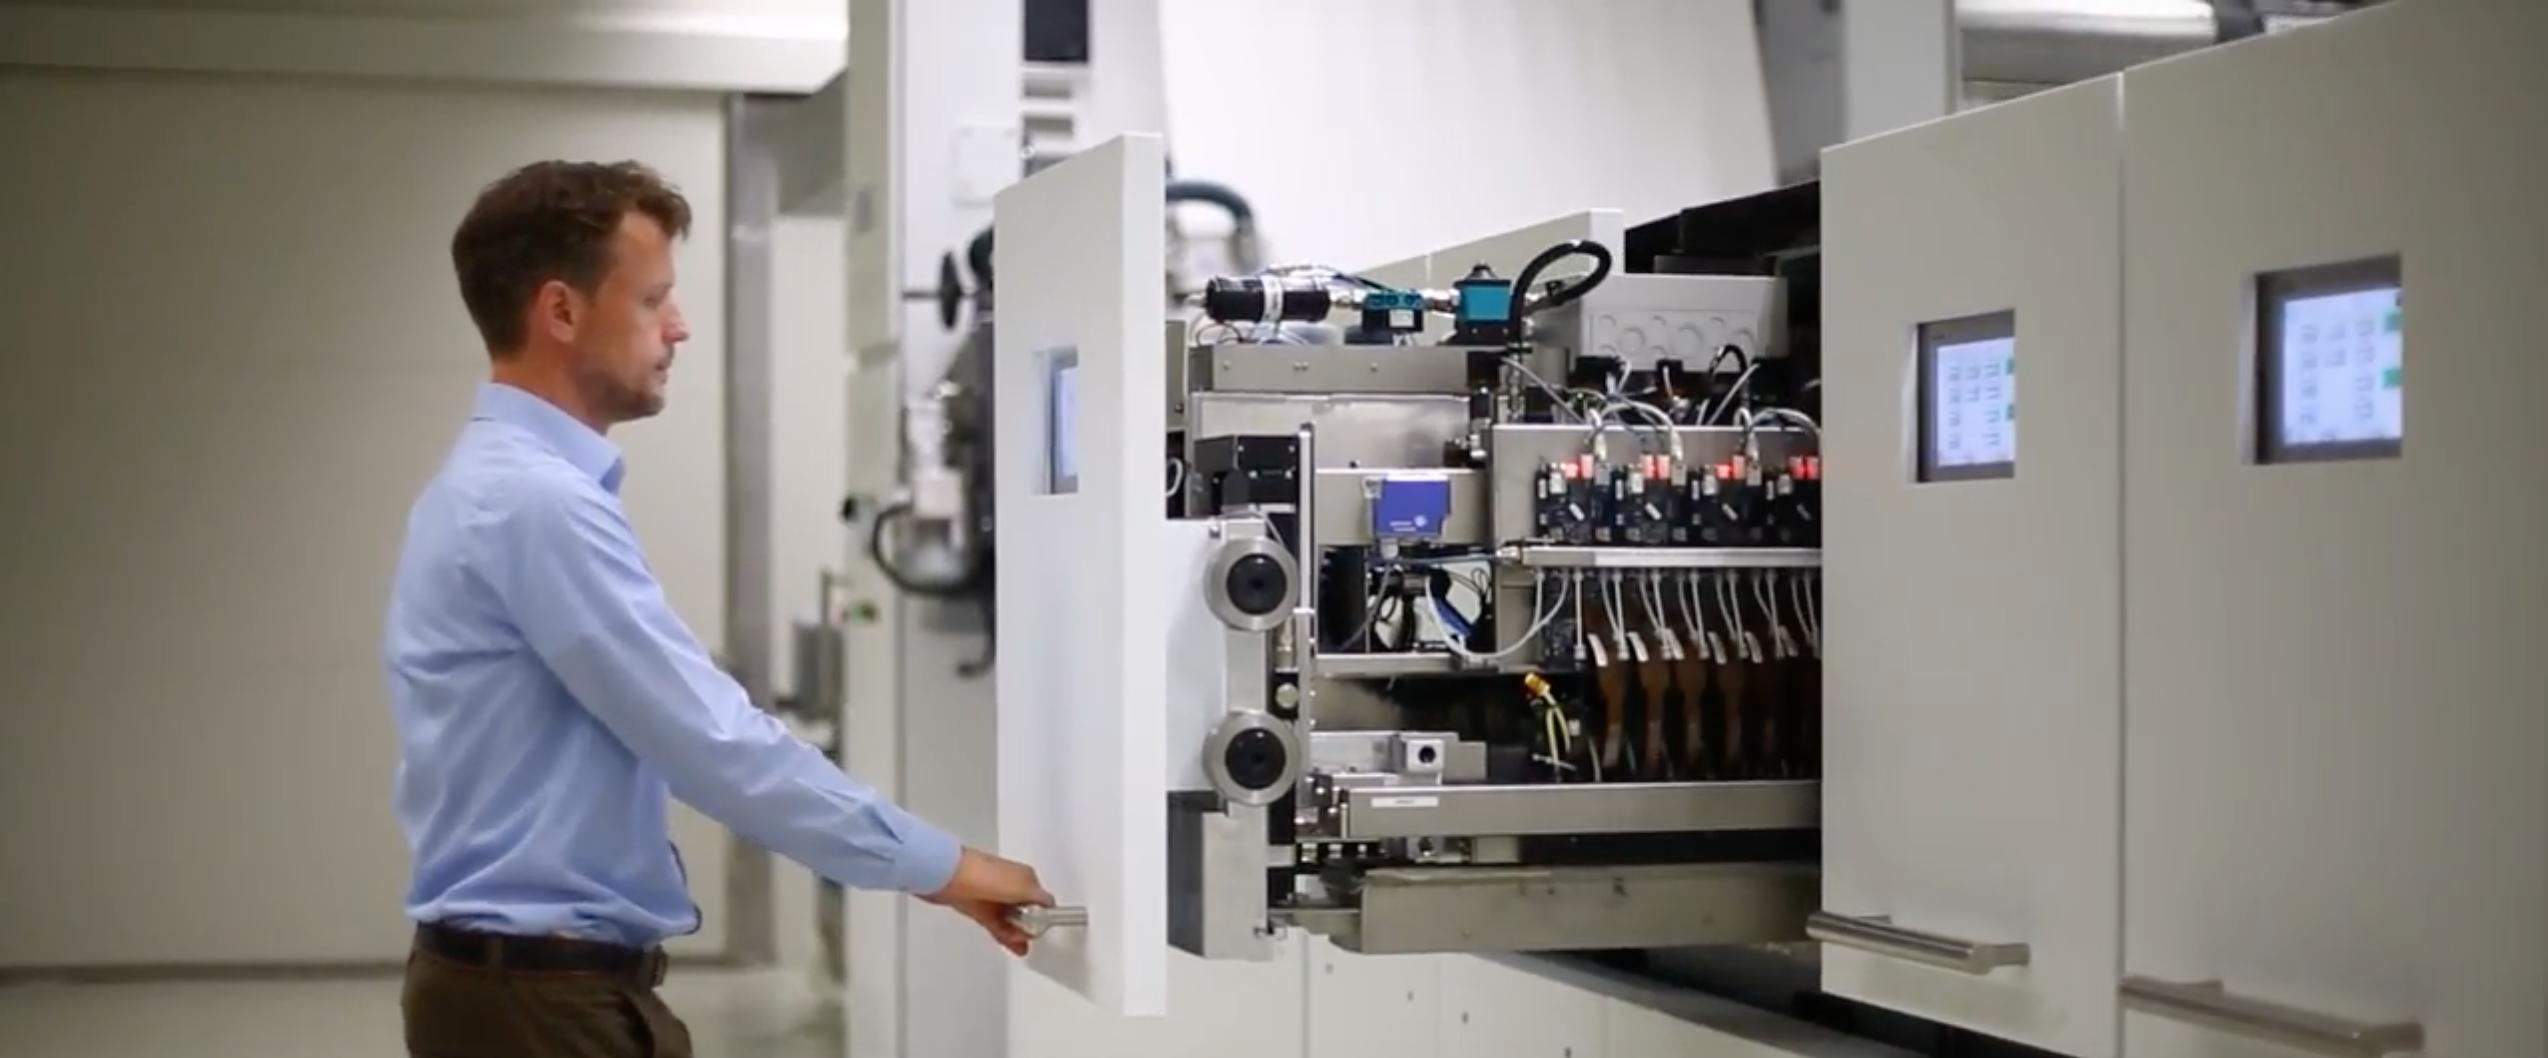 digital textile printing market report